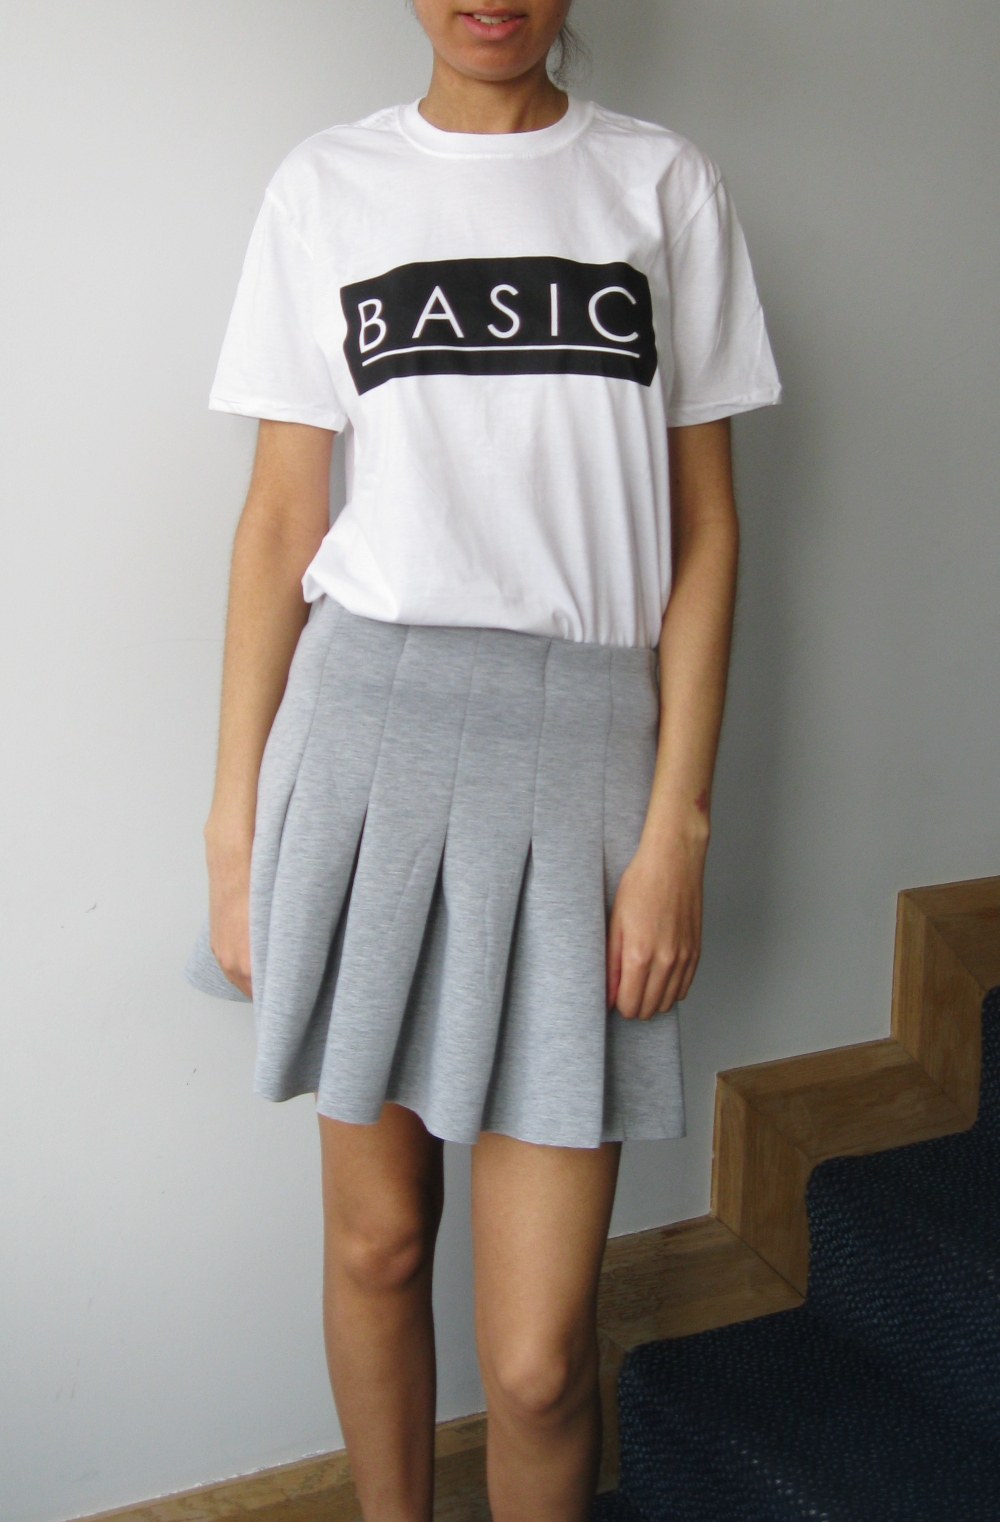 Basic tee 5